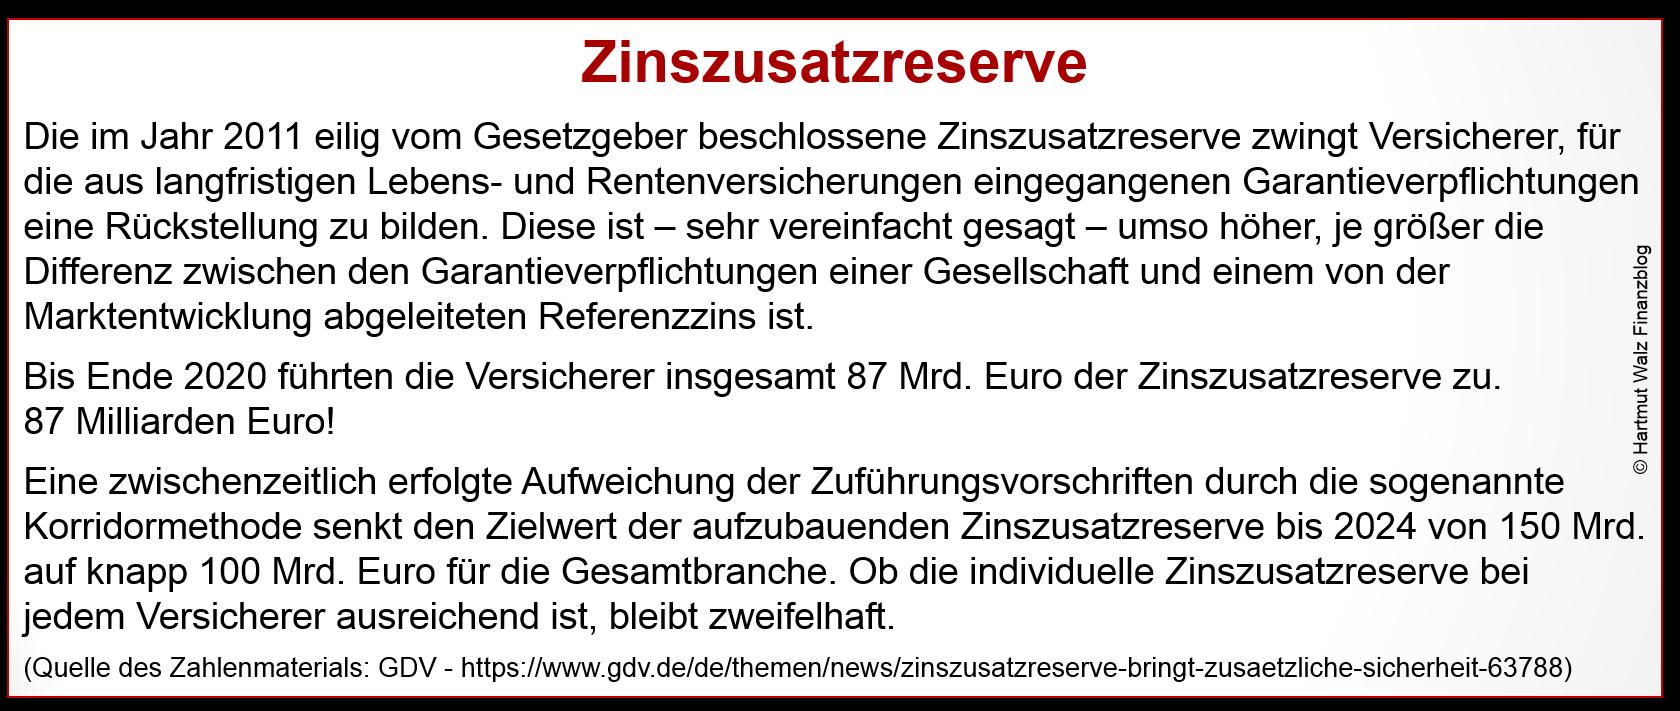 Zinzusatzreserve_